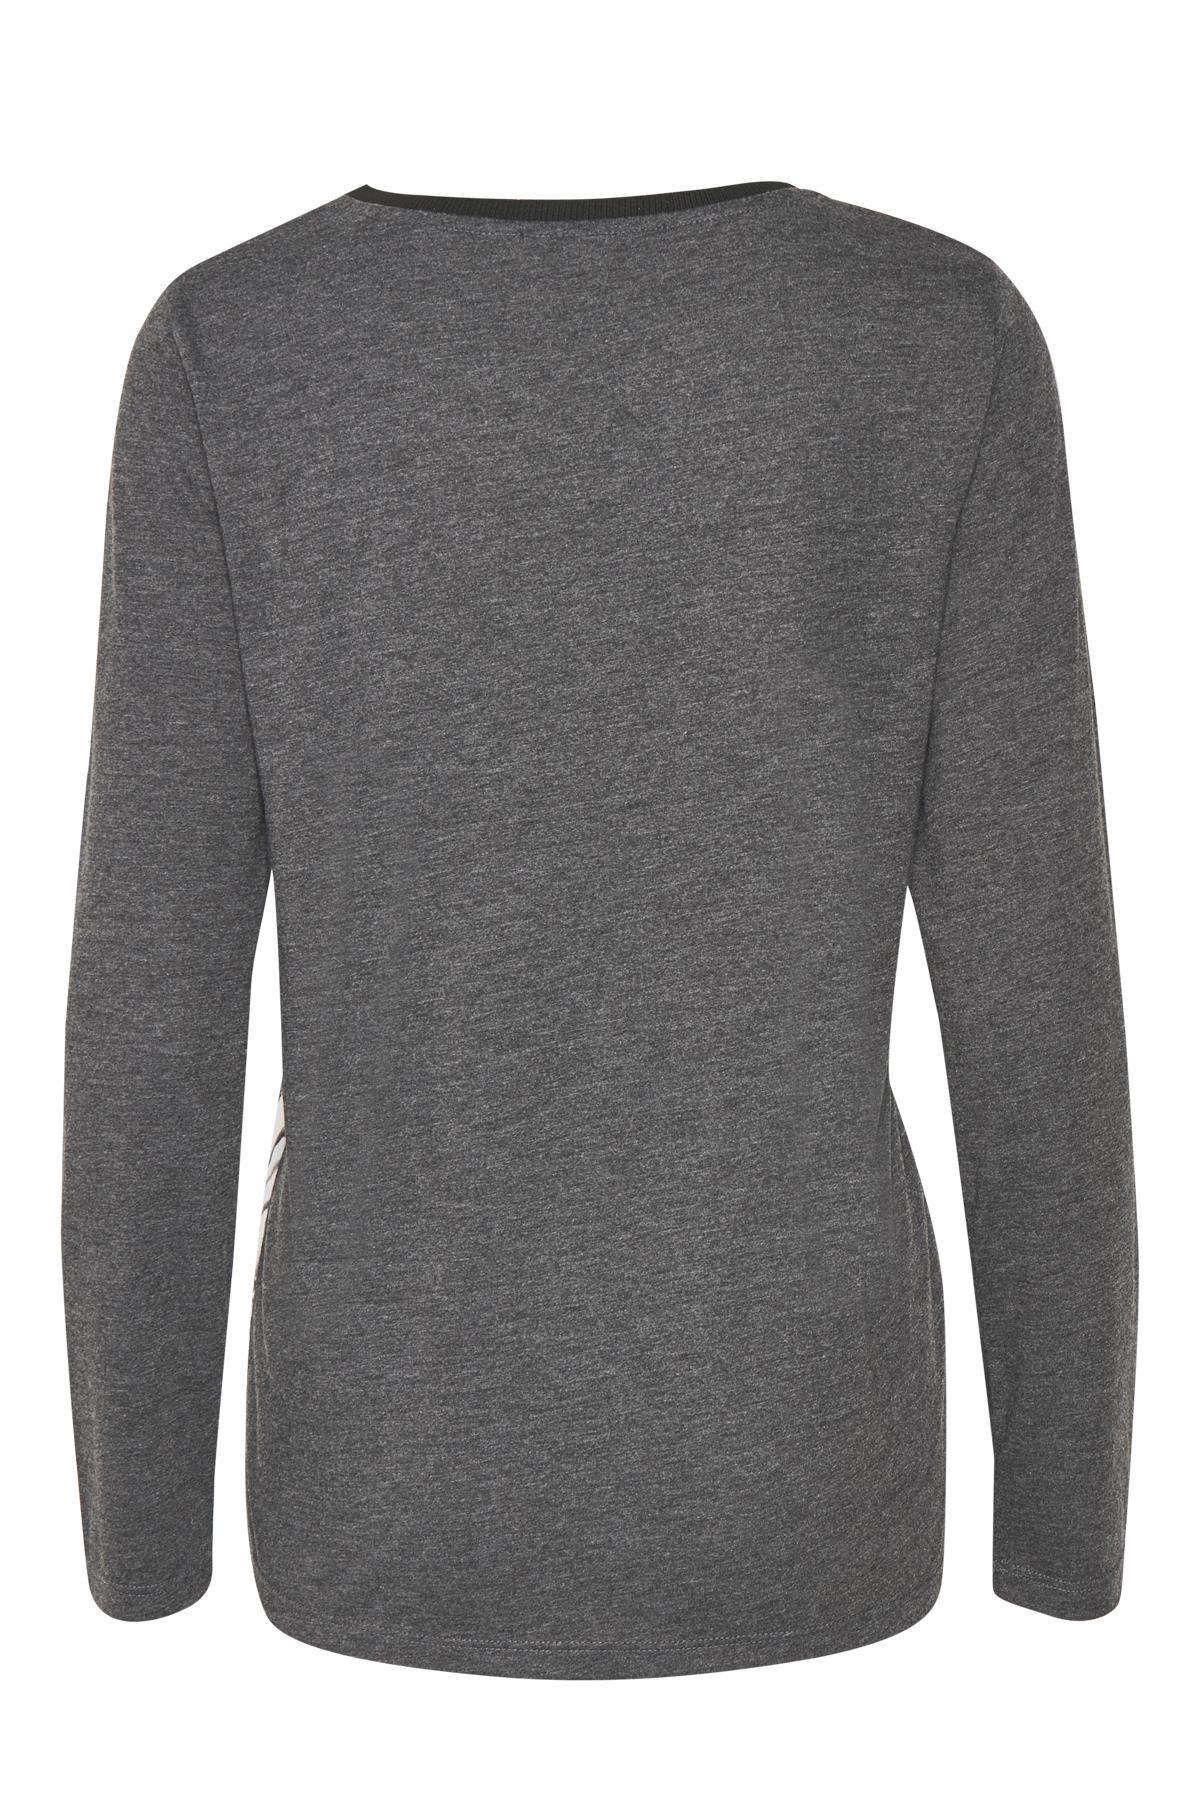 Wollweiß Bluse von Bon'A Parte – Shoppen Sie Wollweiß Bluse ab Gr. S-2XL hier